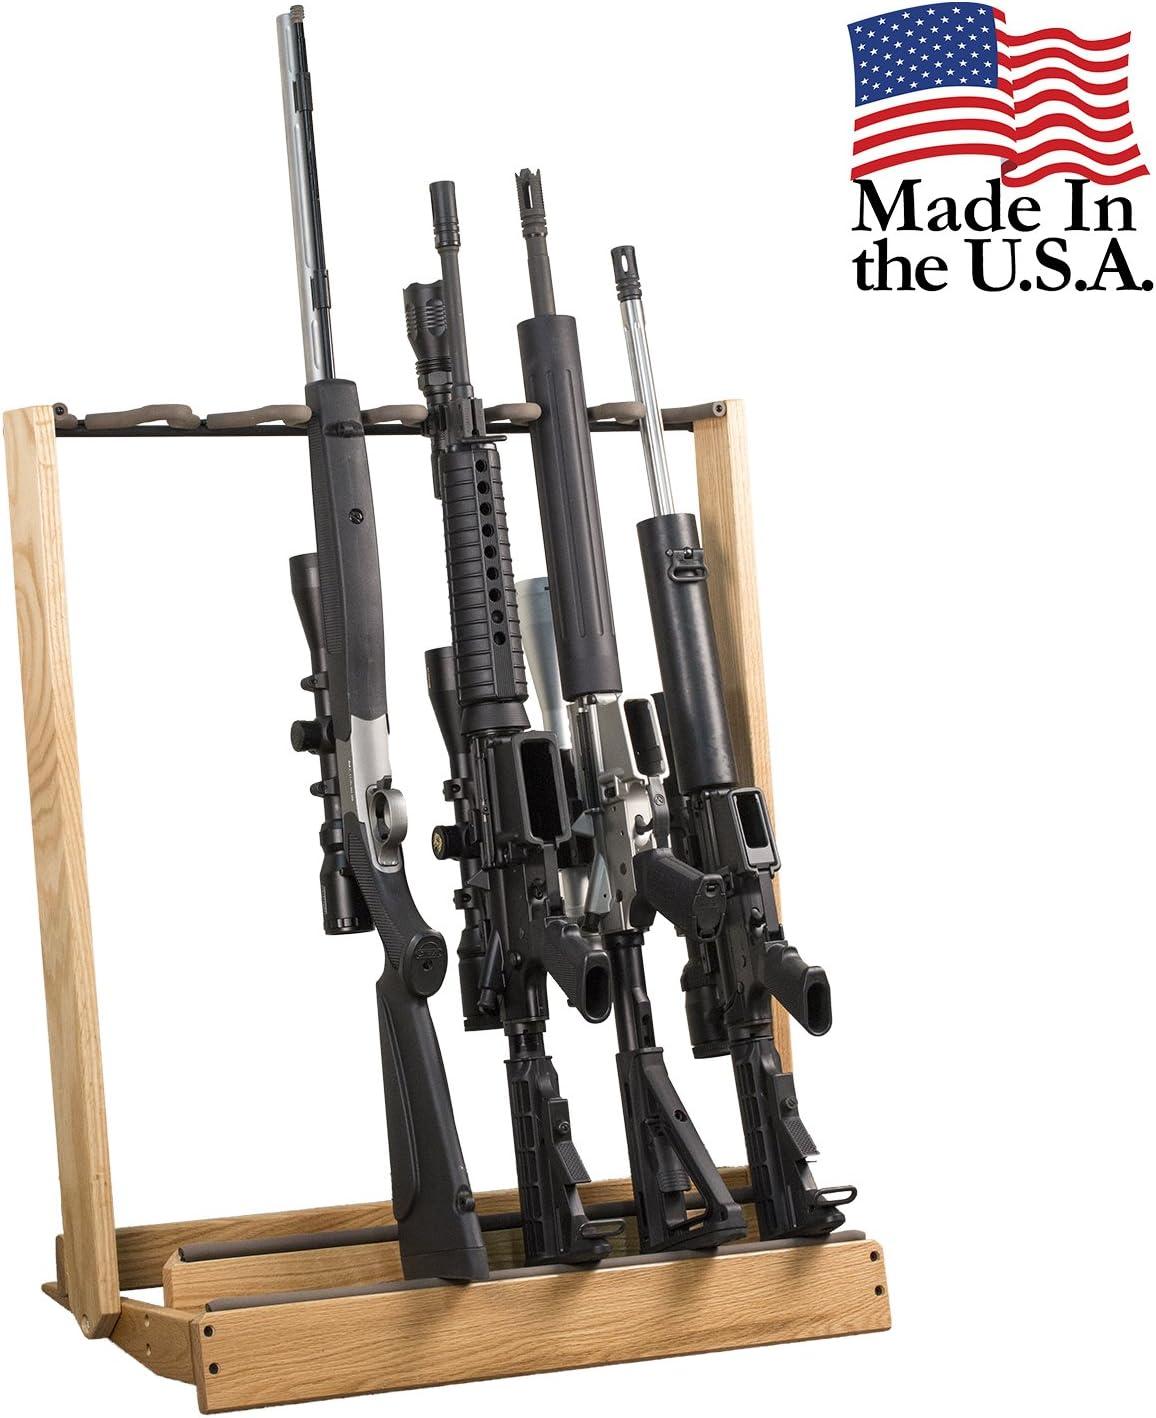 Hardwood Folding Gun Rack or Bow Holder: Sports & Outdoors